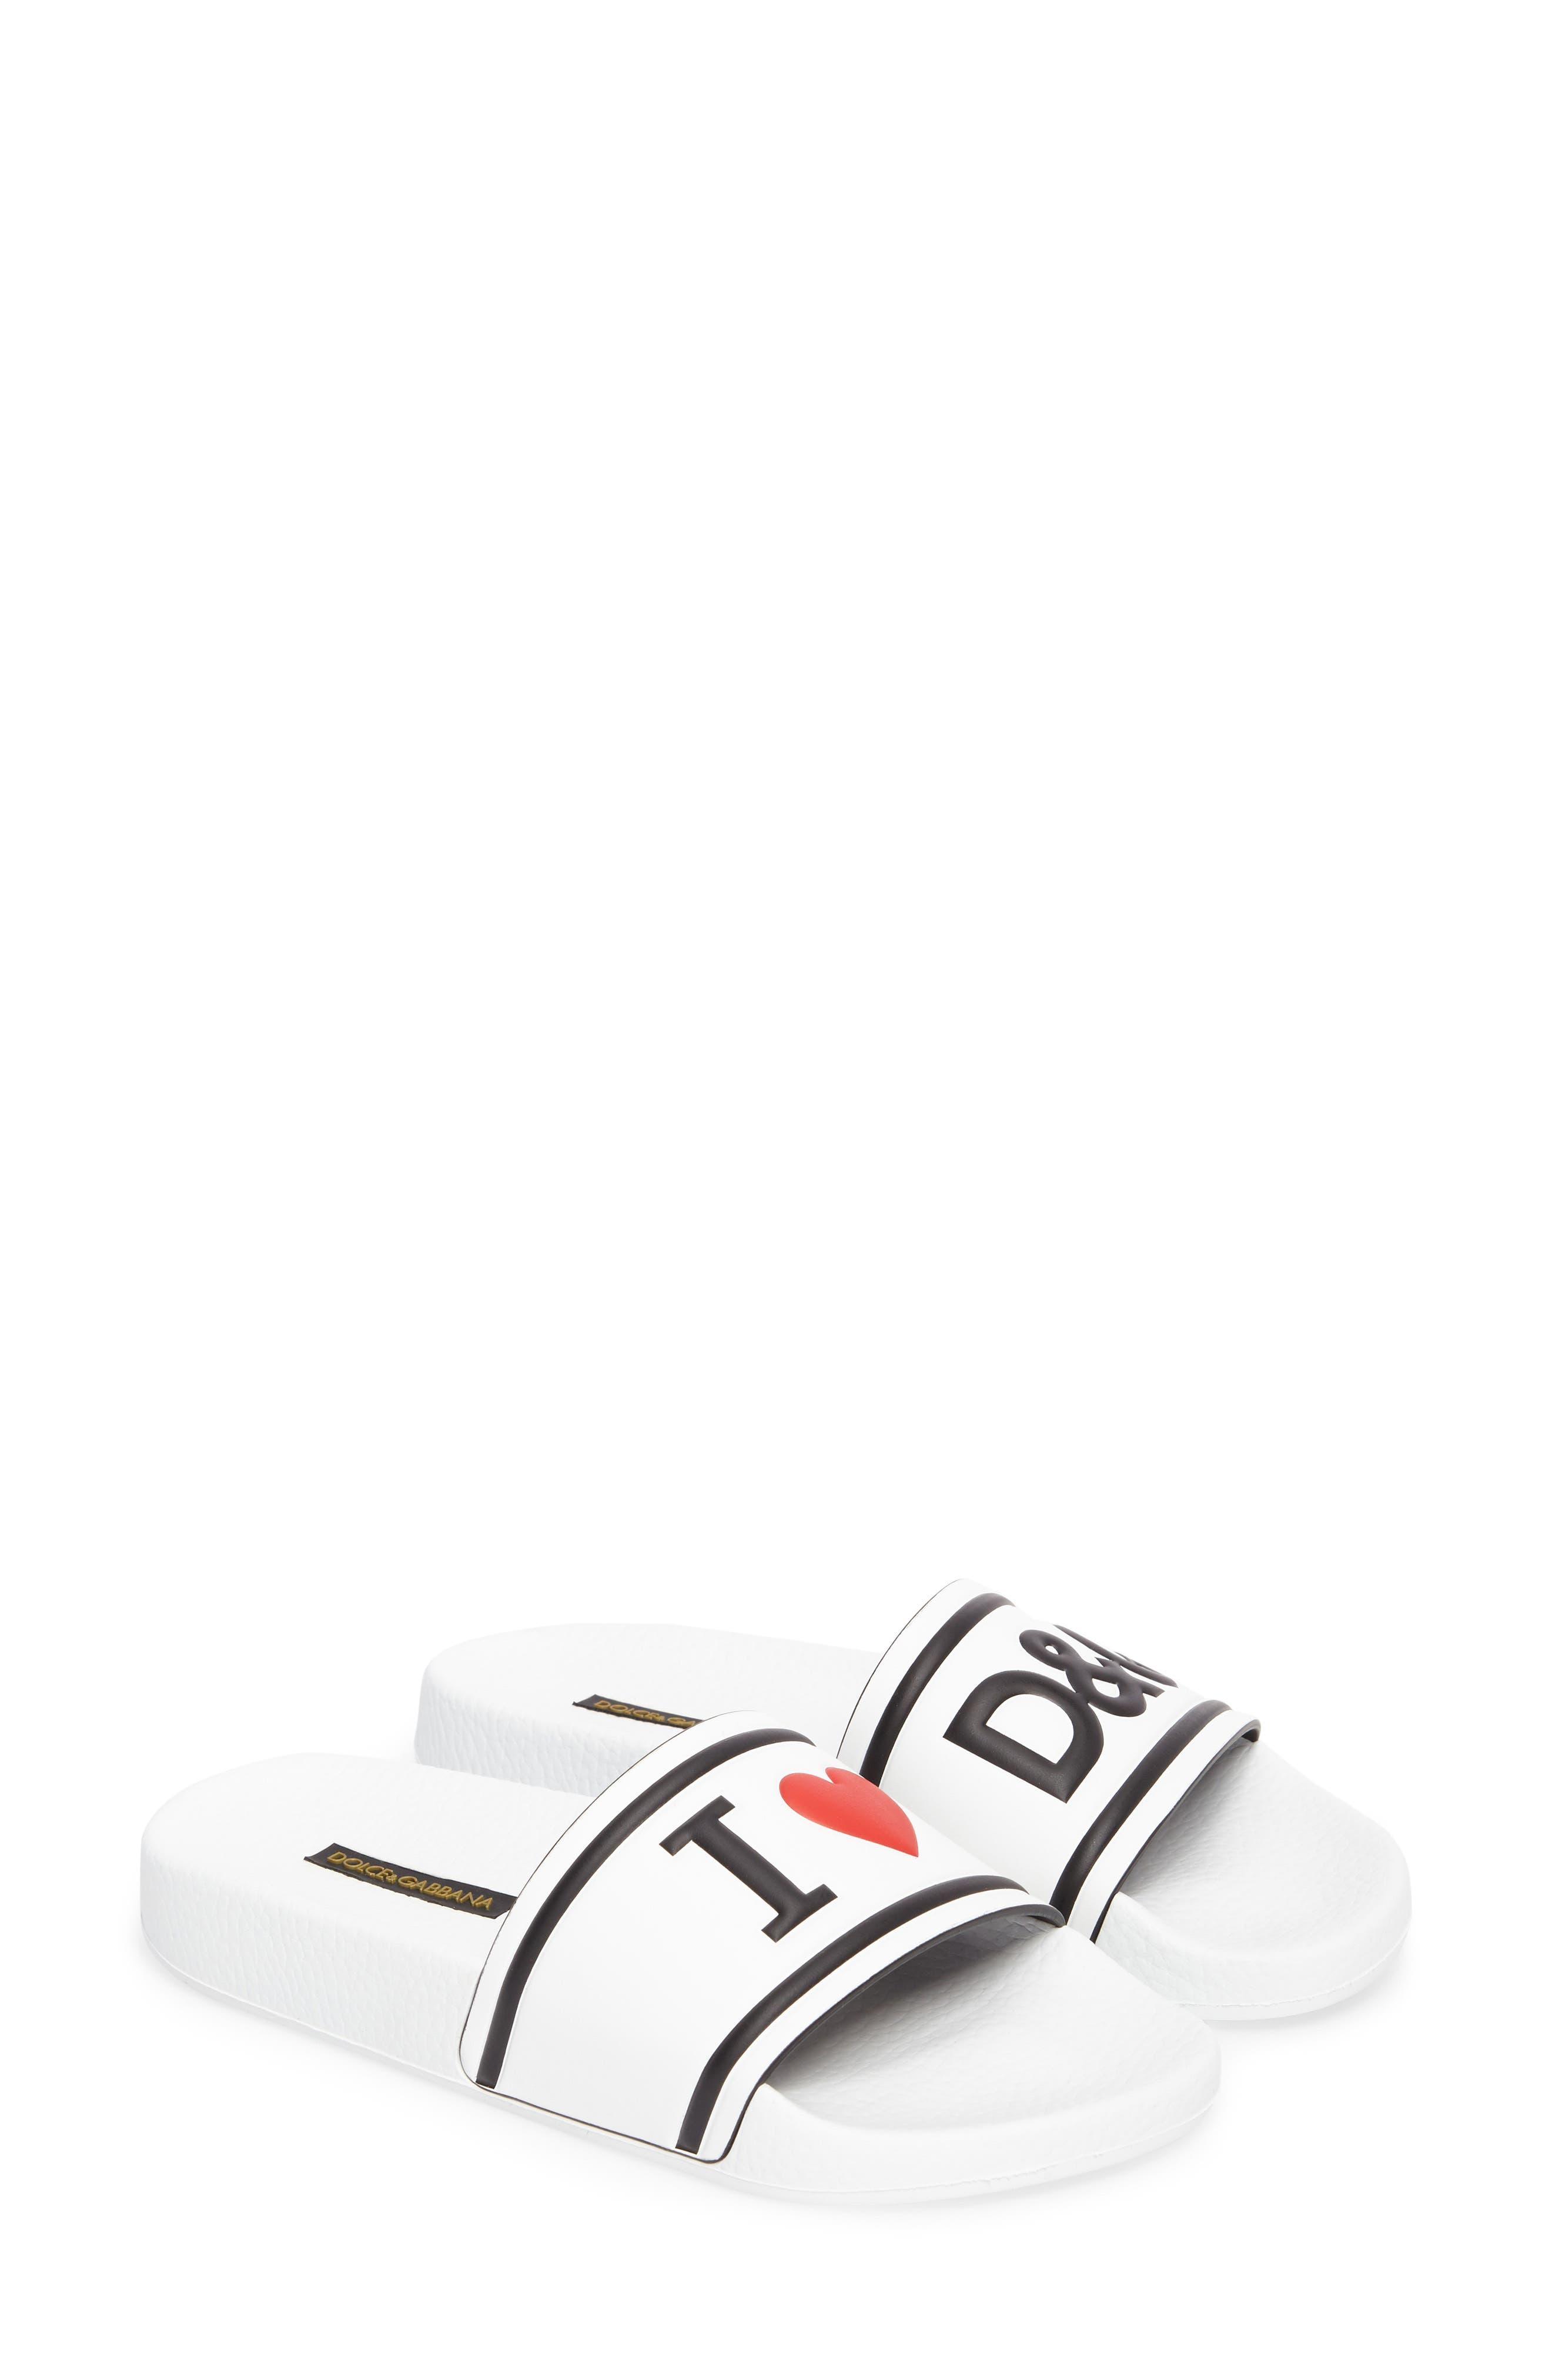 24e79488e2629 Slides Dolce and Gabbana Shoes for Women